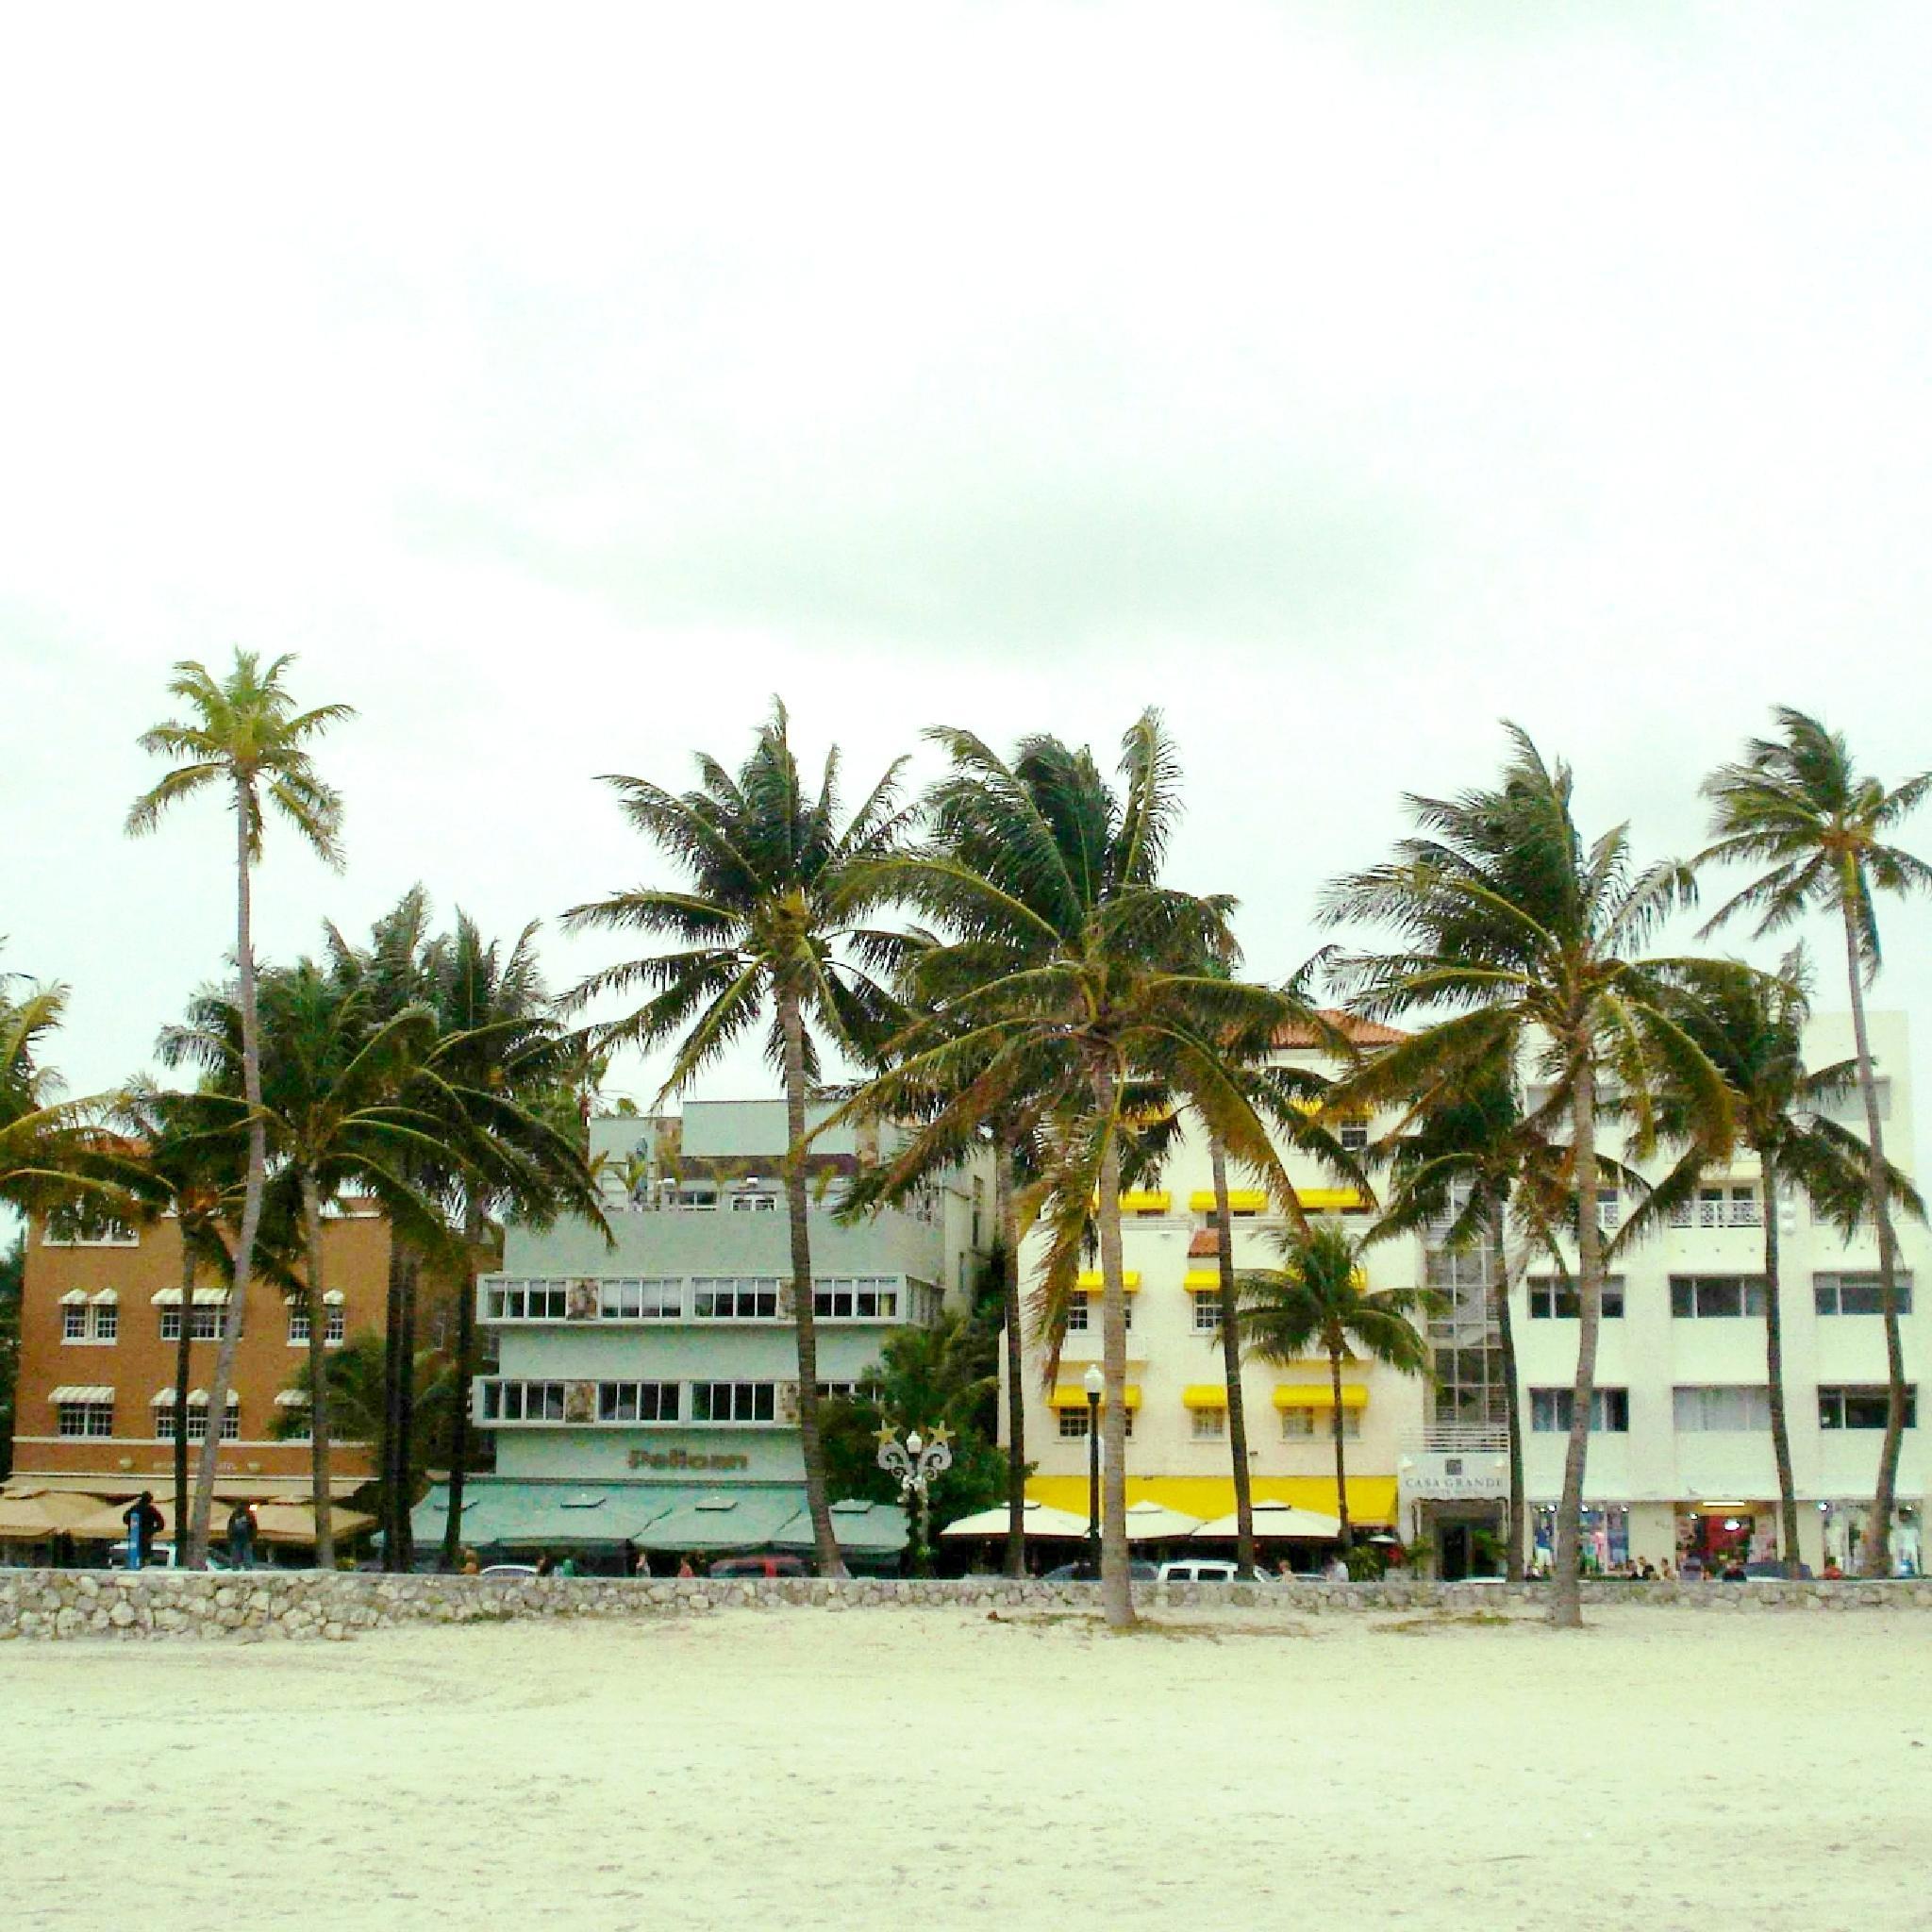 South beach Miami by Biljana OdMakedonija